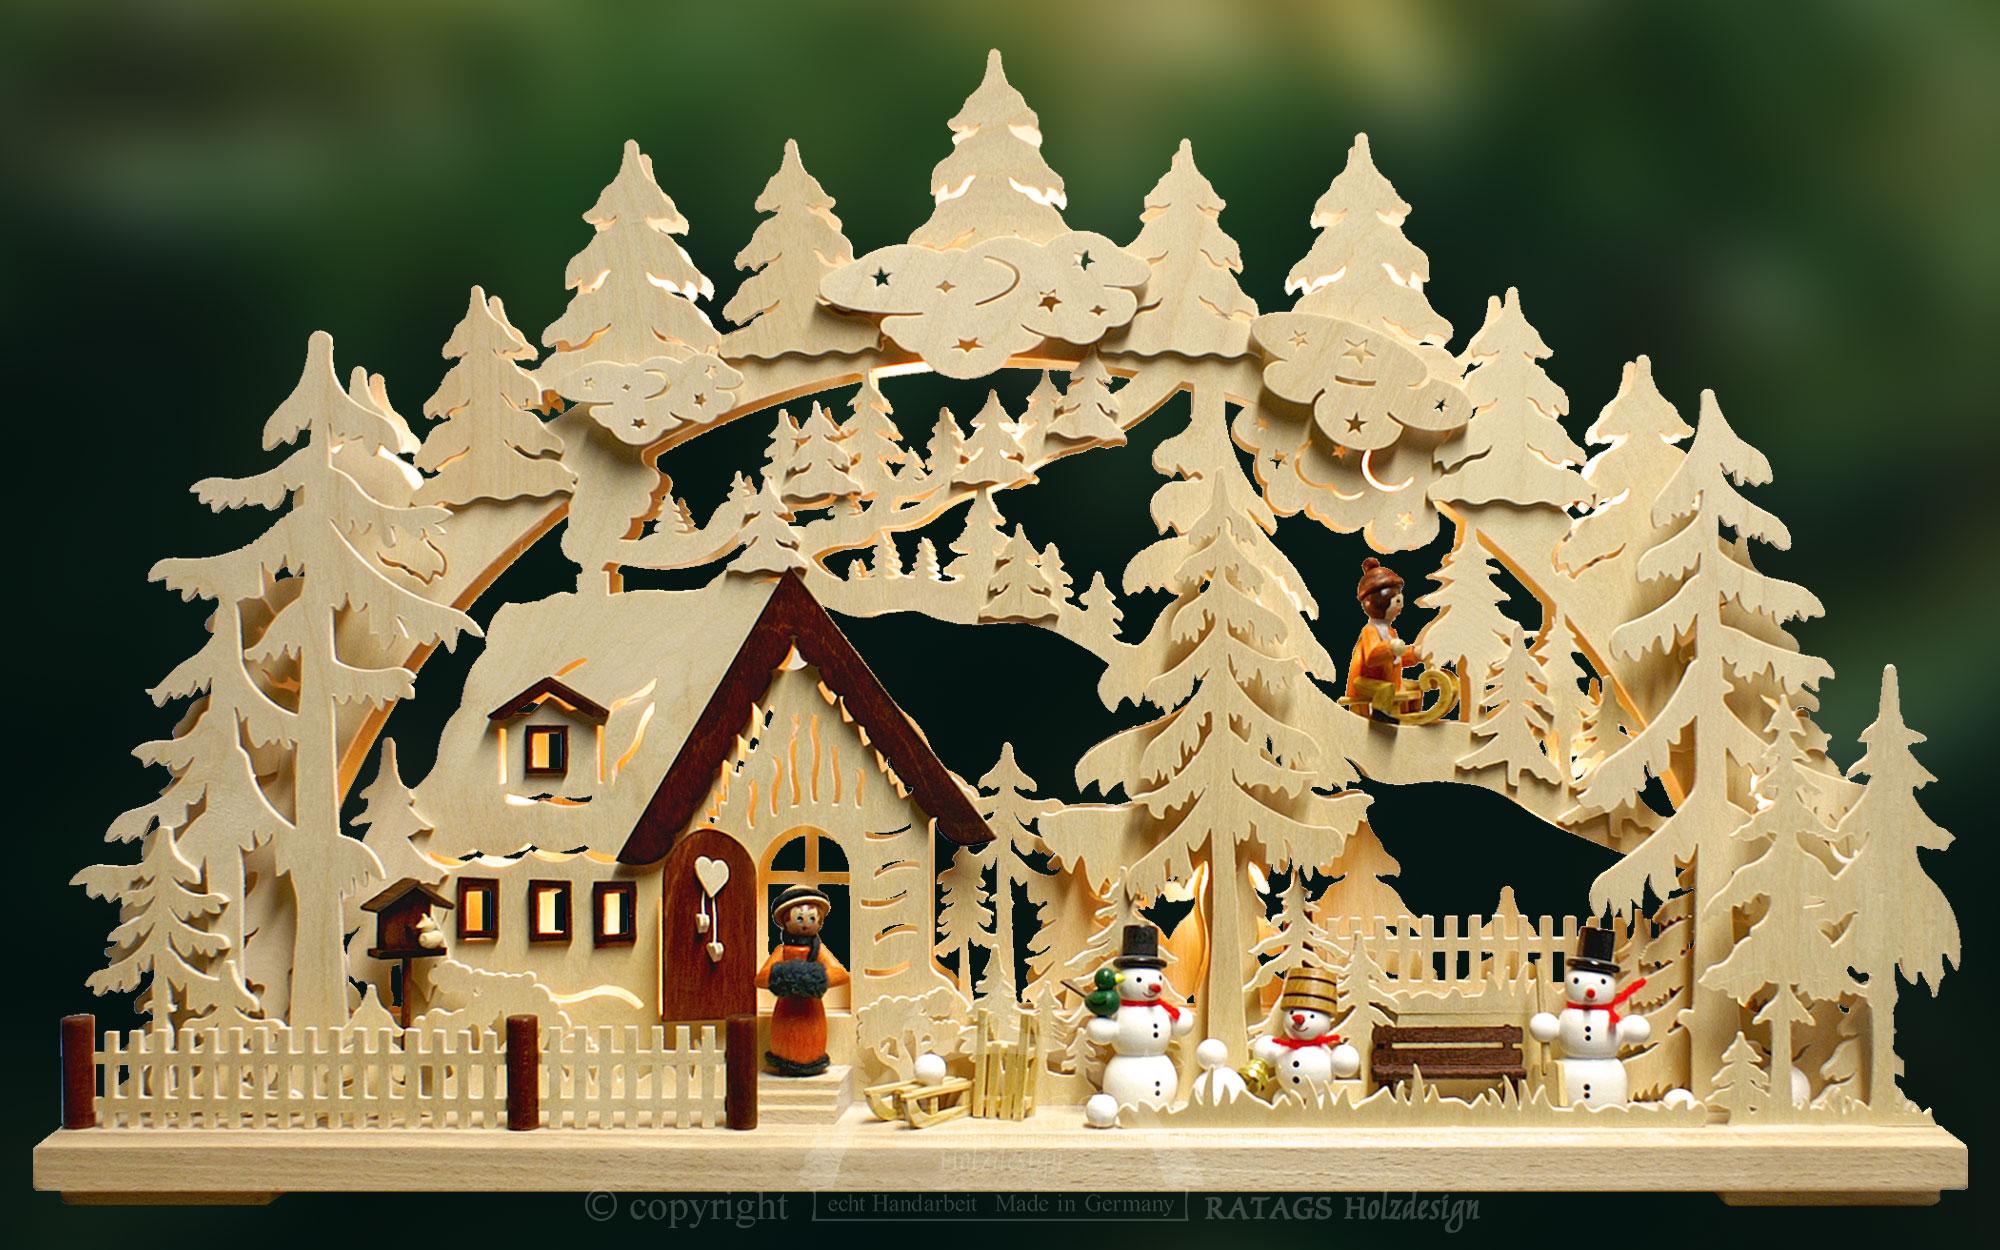 3d schwibbogen gr winterlandschaft winter schwibbogen weihnachtsartikel onlineshop ratags. Black Bedroom Furniture Sets. Home Design Ideas